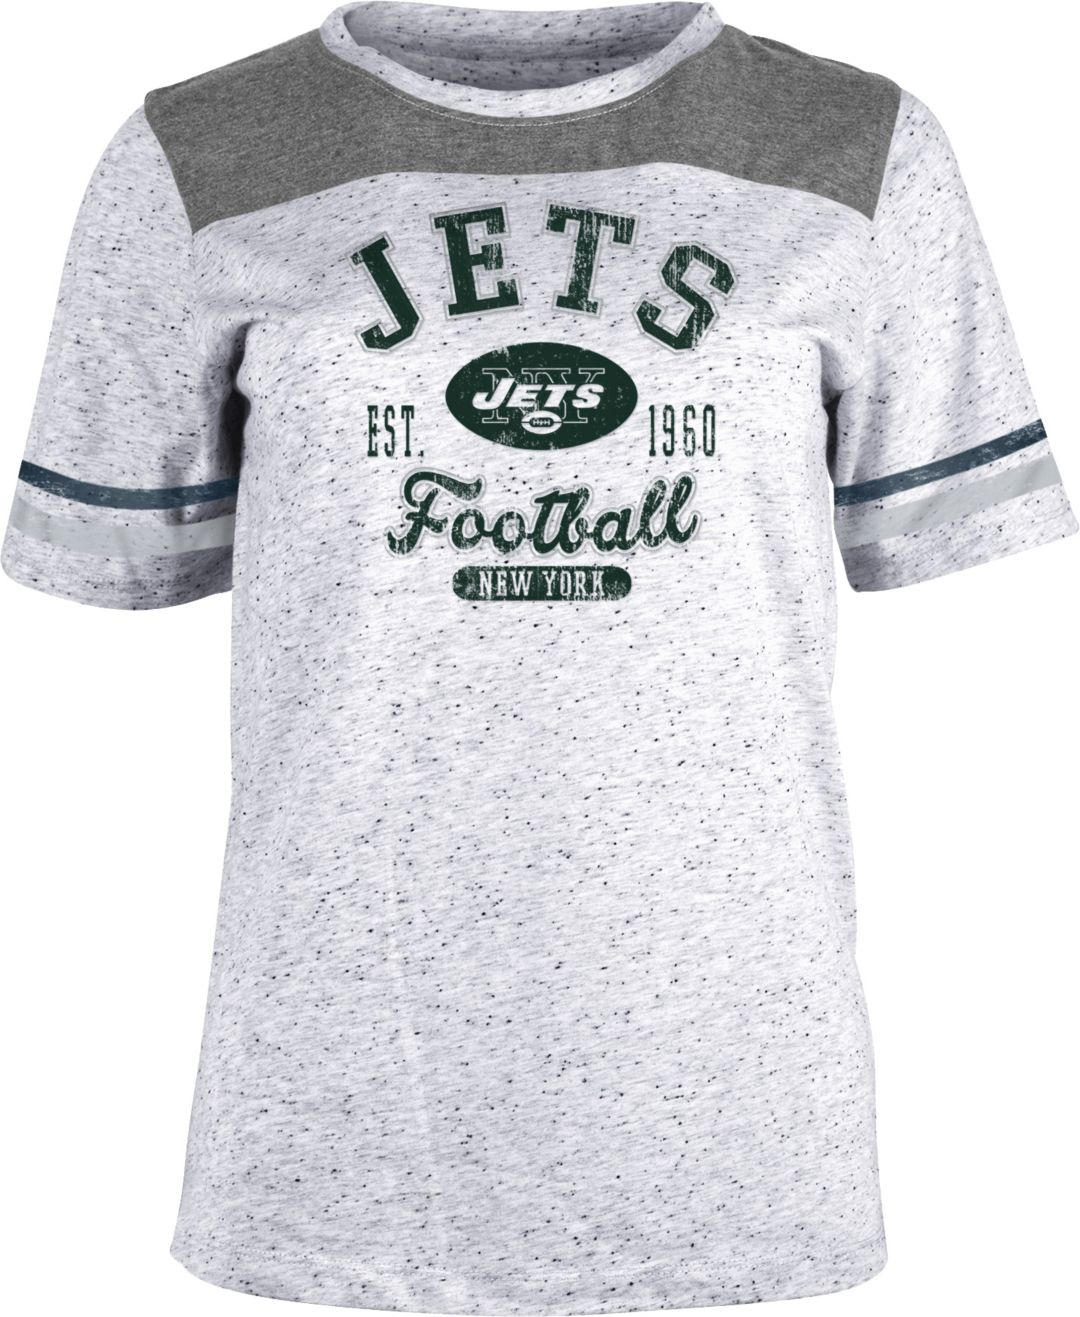 e7f8ea54 NFL Team Apparel Women's New York Jets Peppercorn T-Shirt